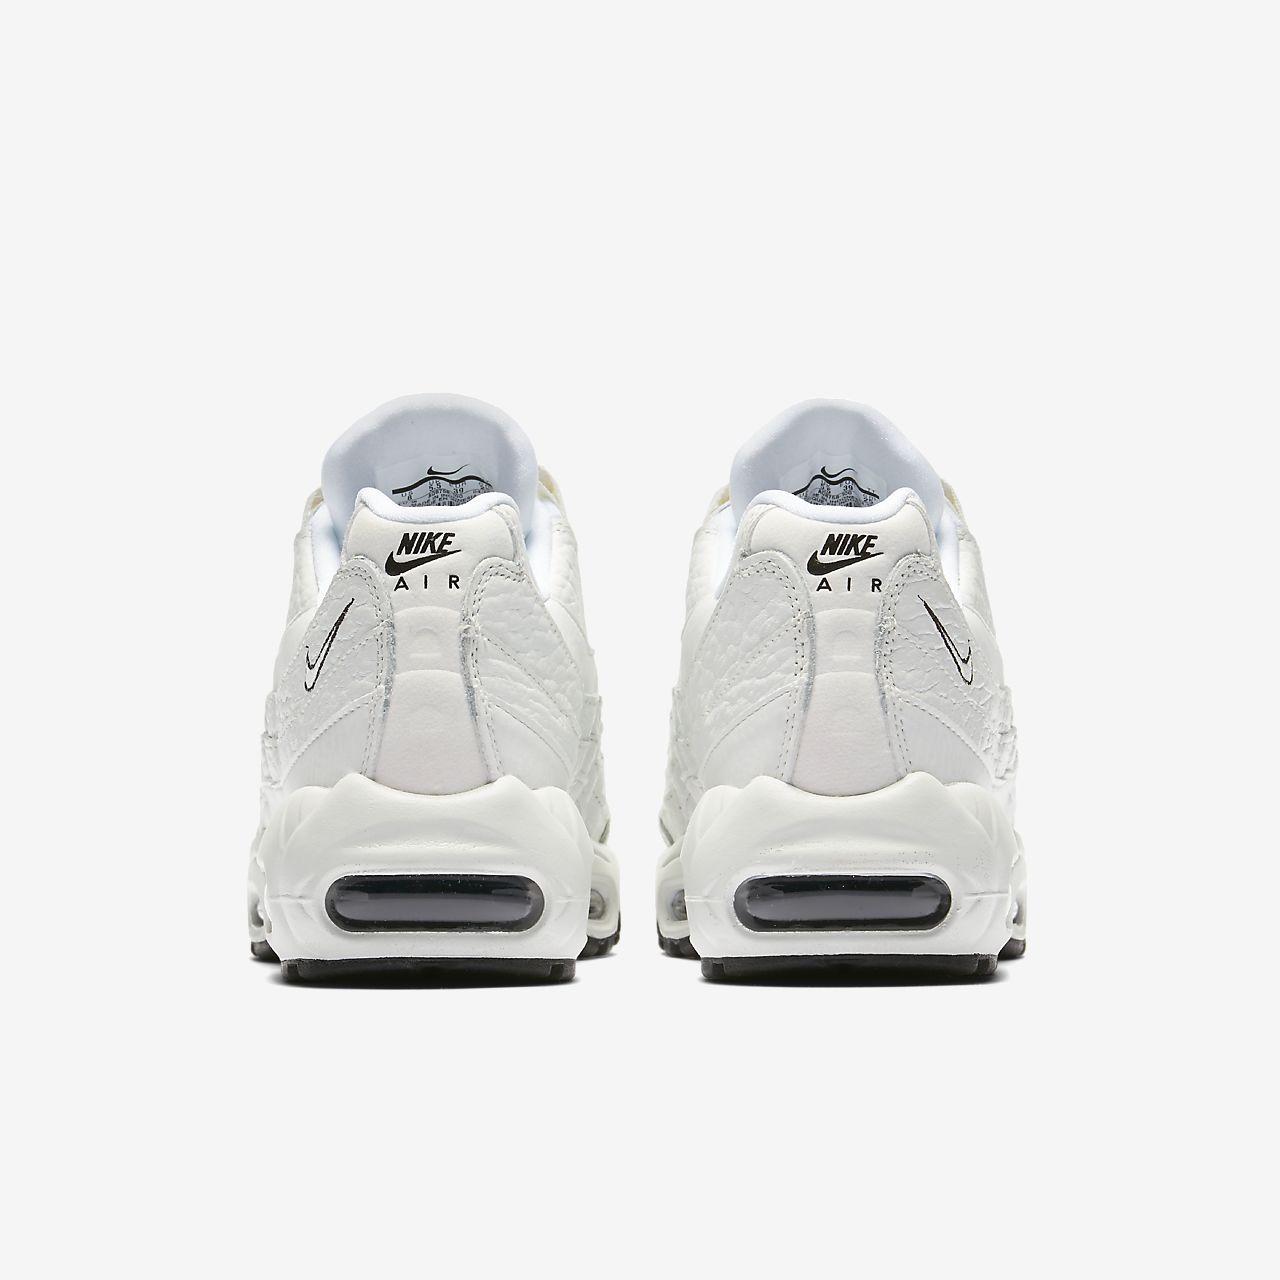 scarpa nike air max 95 summit whitenerosummit white aq8758 100